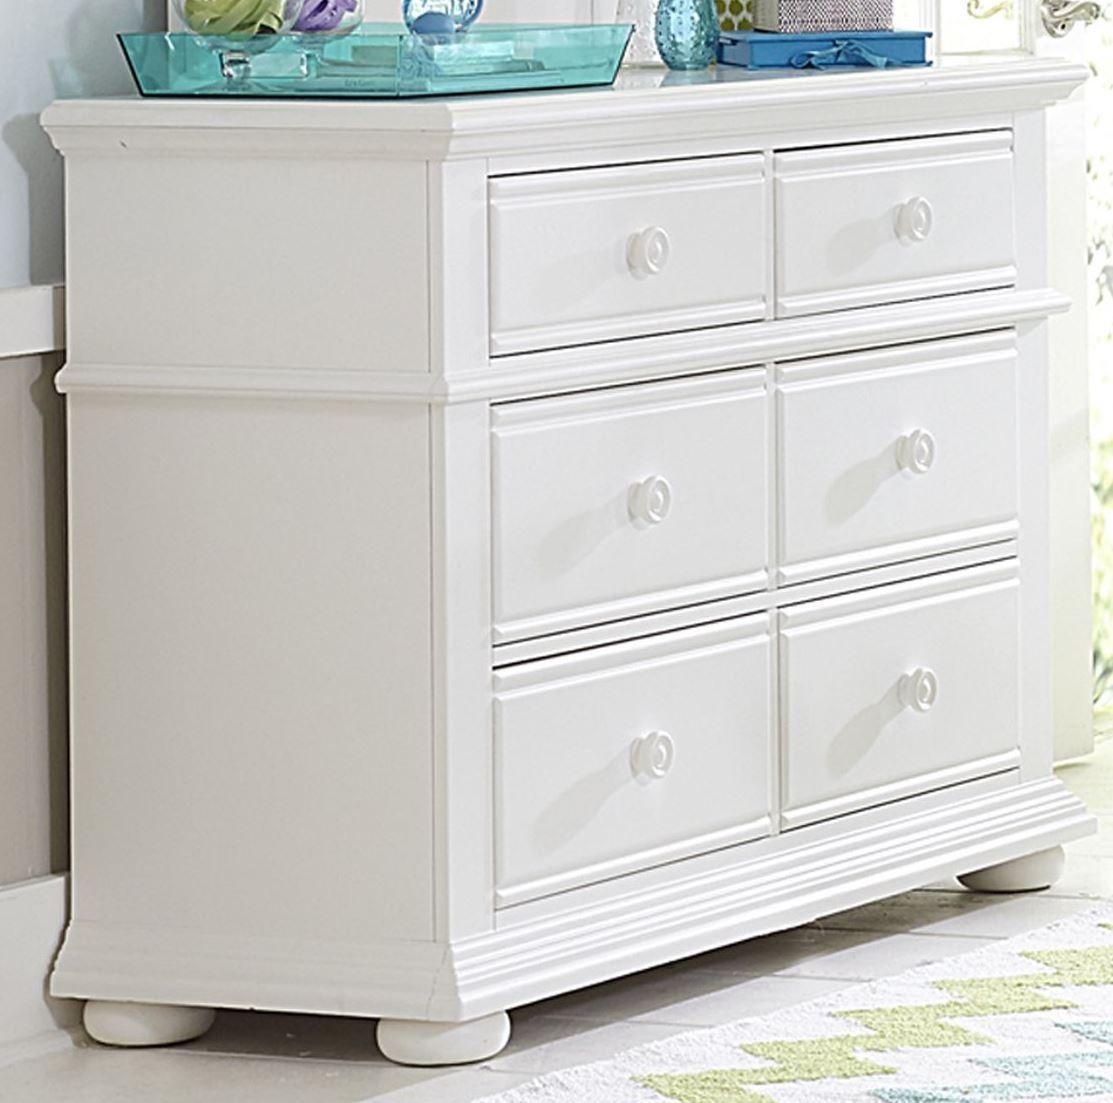 summer house oyster white 6 drawer dresser from liberty coleman furniture. Black Bedroom Furniture Sets. Home Design Ideas